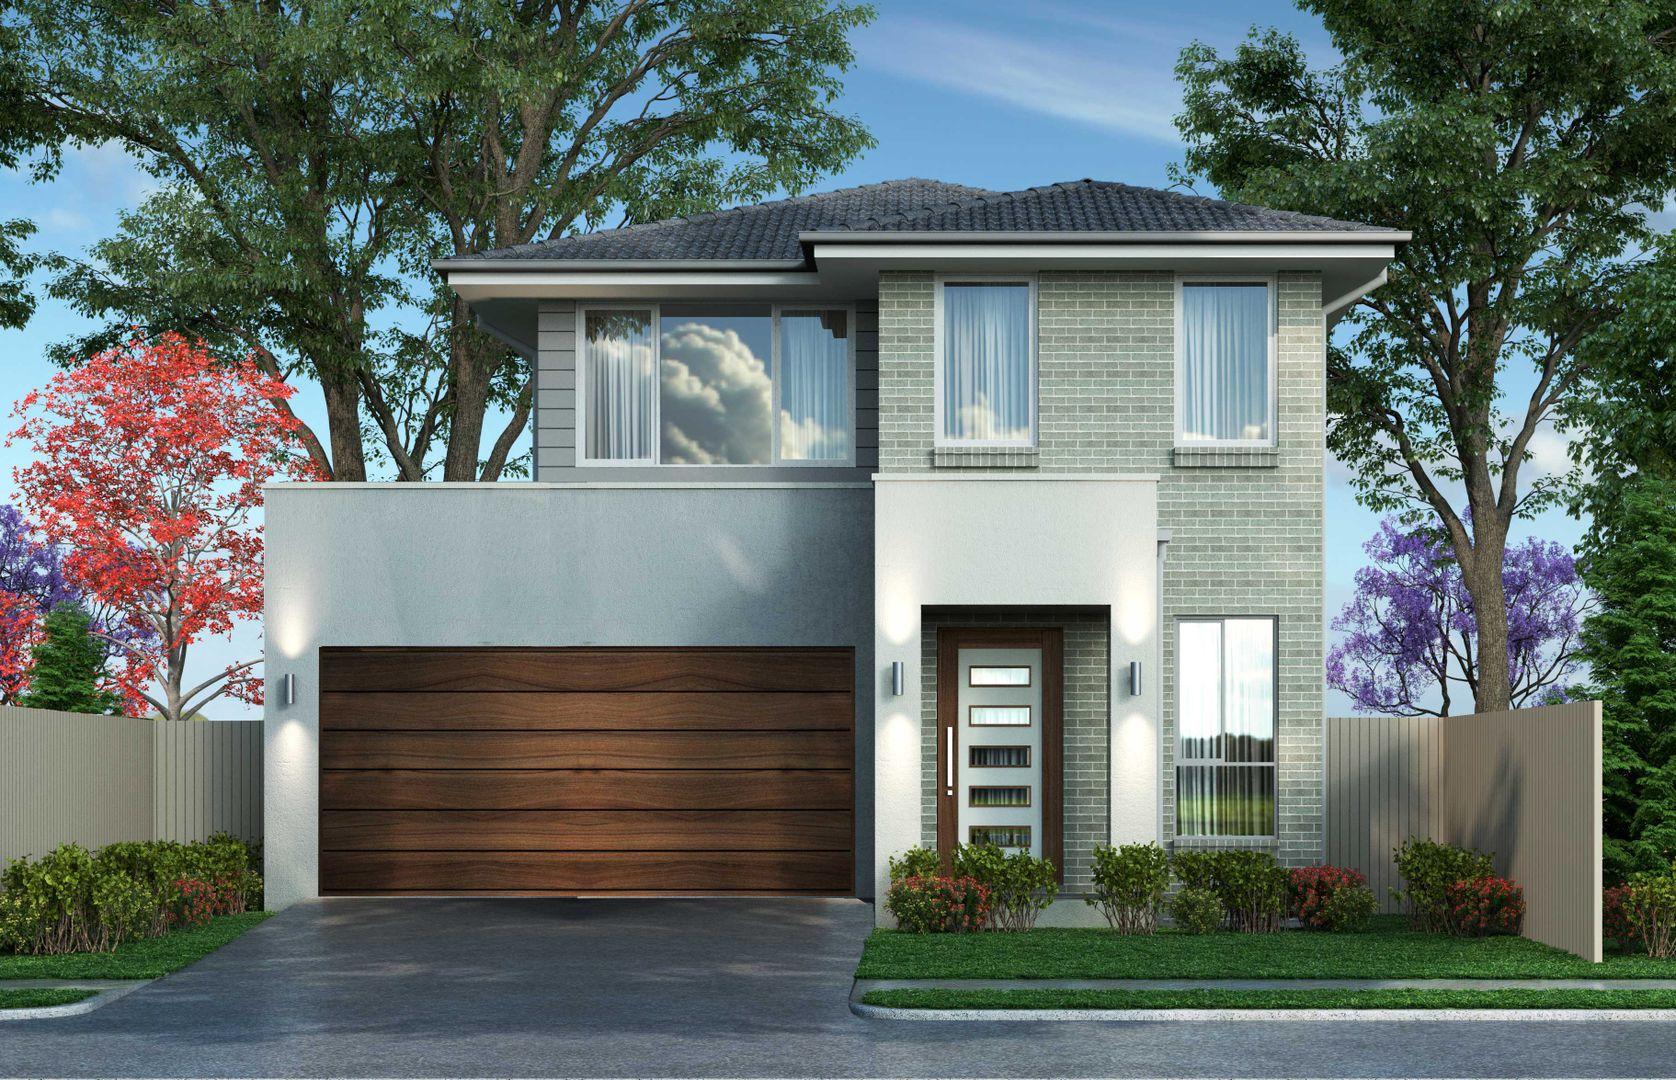 Lot 1226 Ansell St, Marsden Park NSW 2765, Image 0